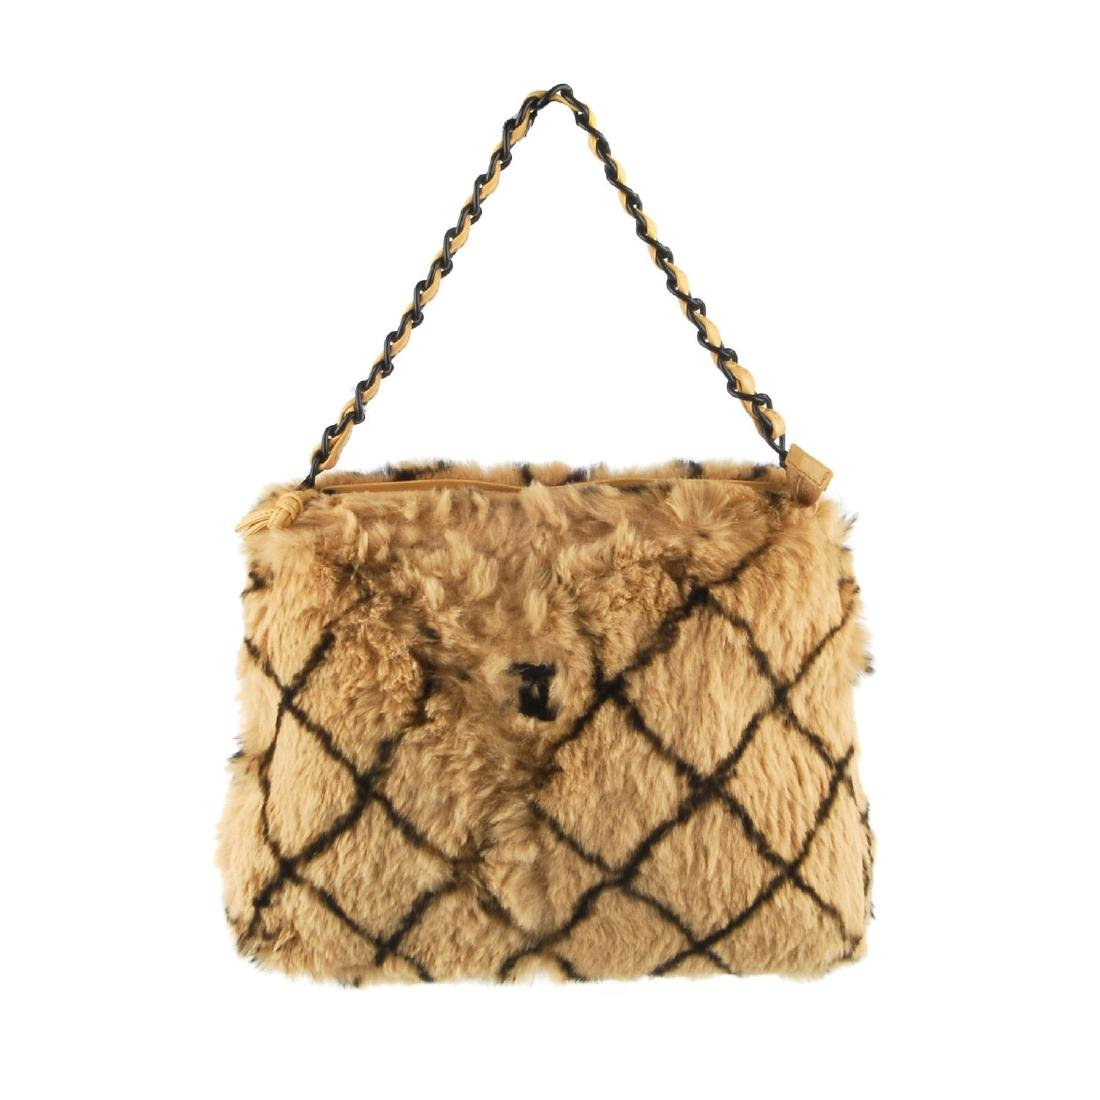 CHANEL - a fur handbag. Designed with a light brown